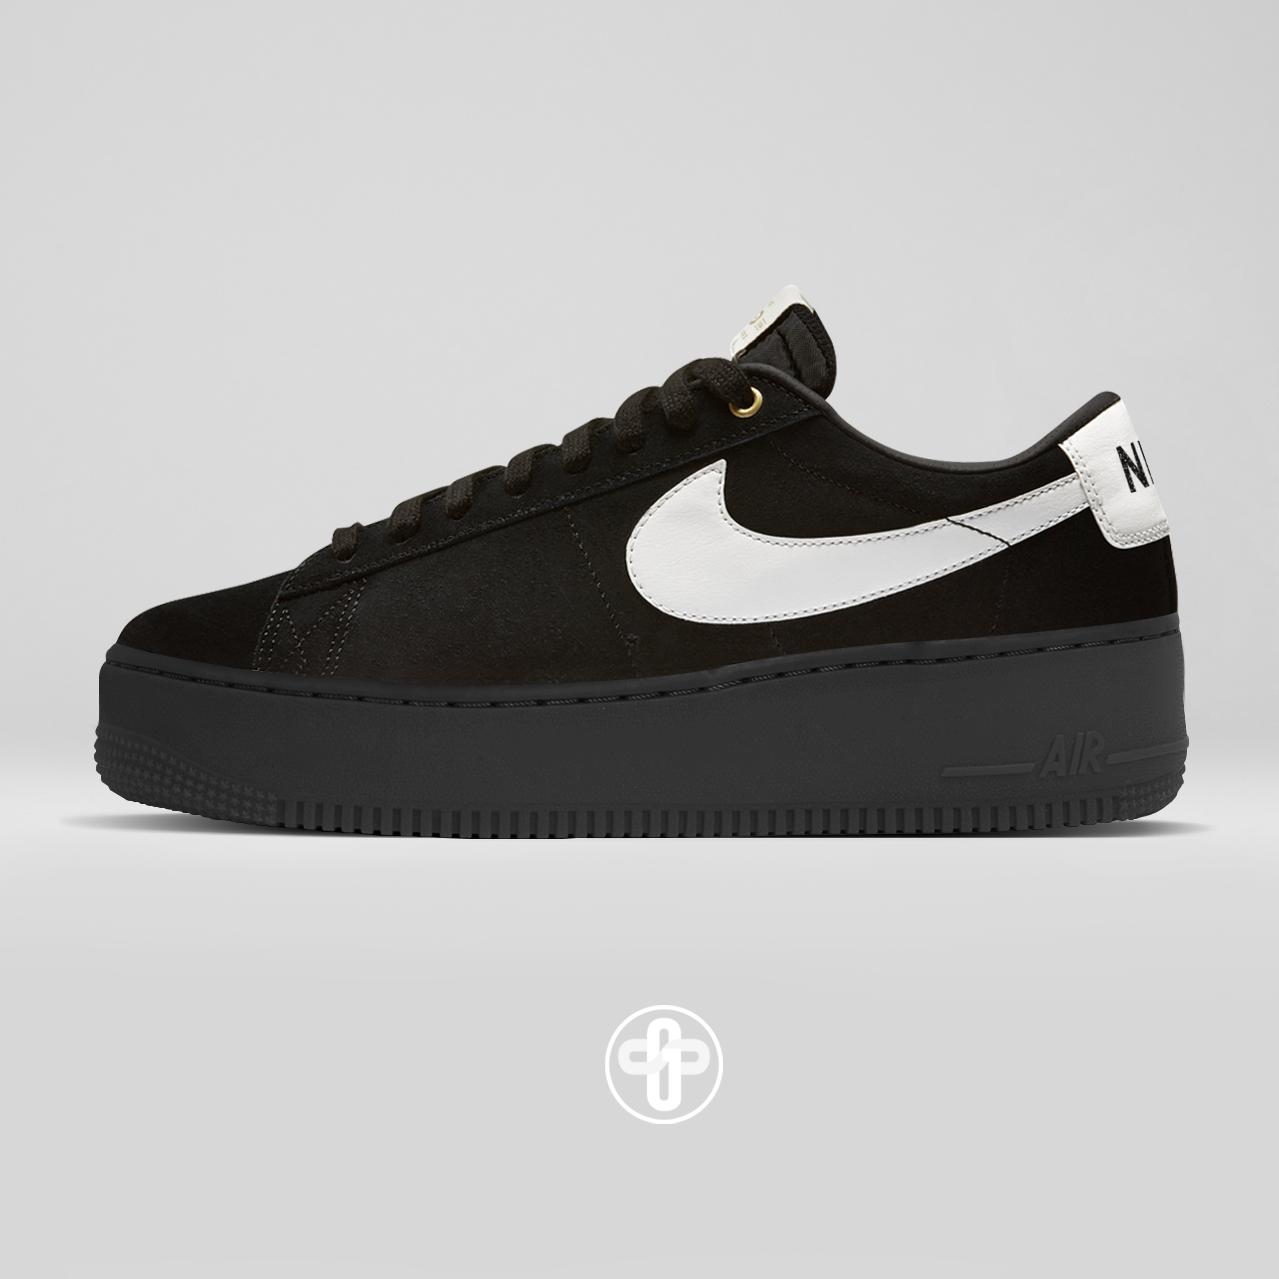 Nike Blazer Creeper Black-White